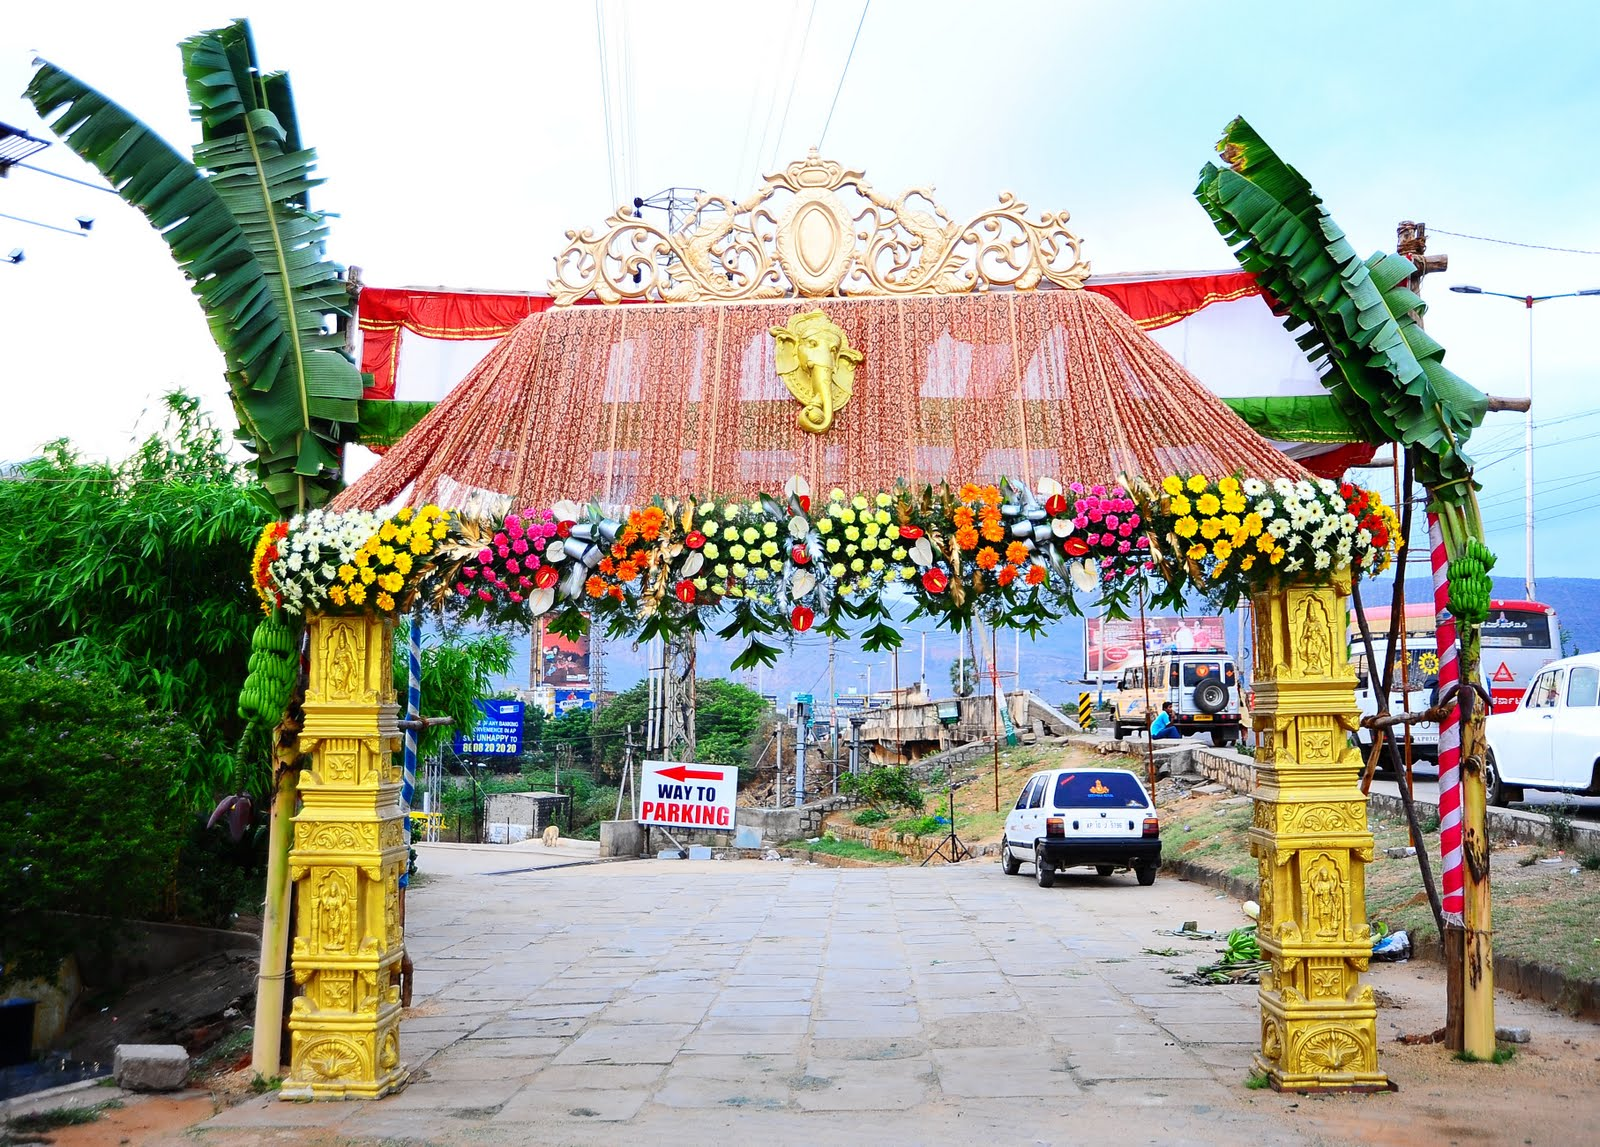 Entrance decoration for wedding entrance decoration for wedding entrance design harinisainath wedding website junglespirit Choice Image